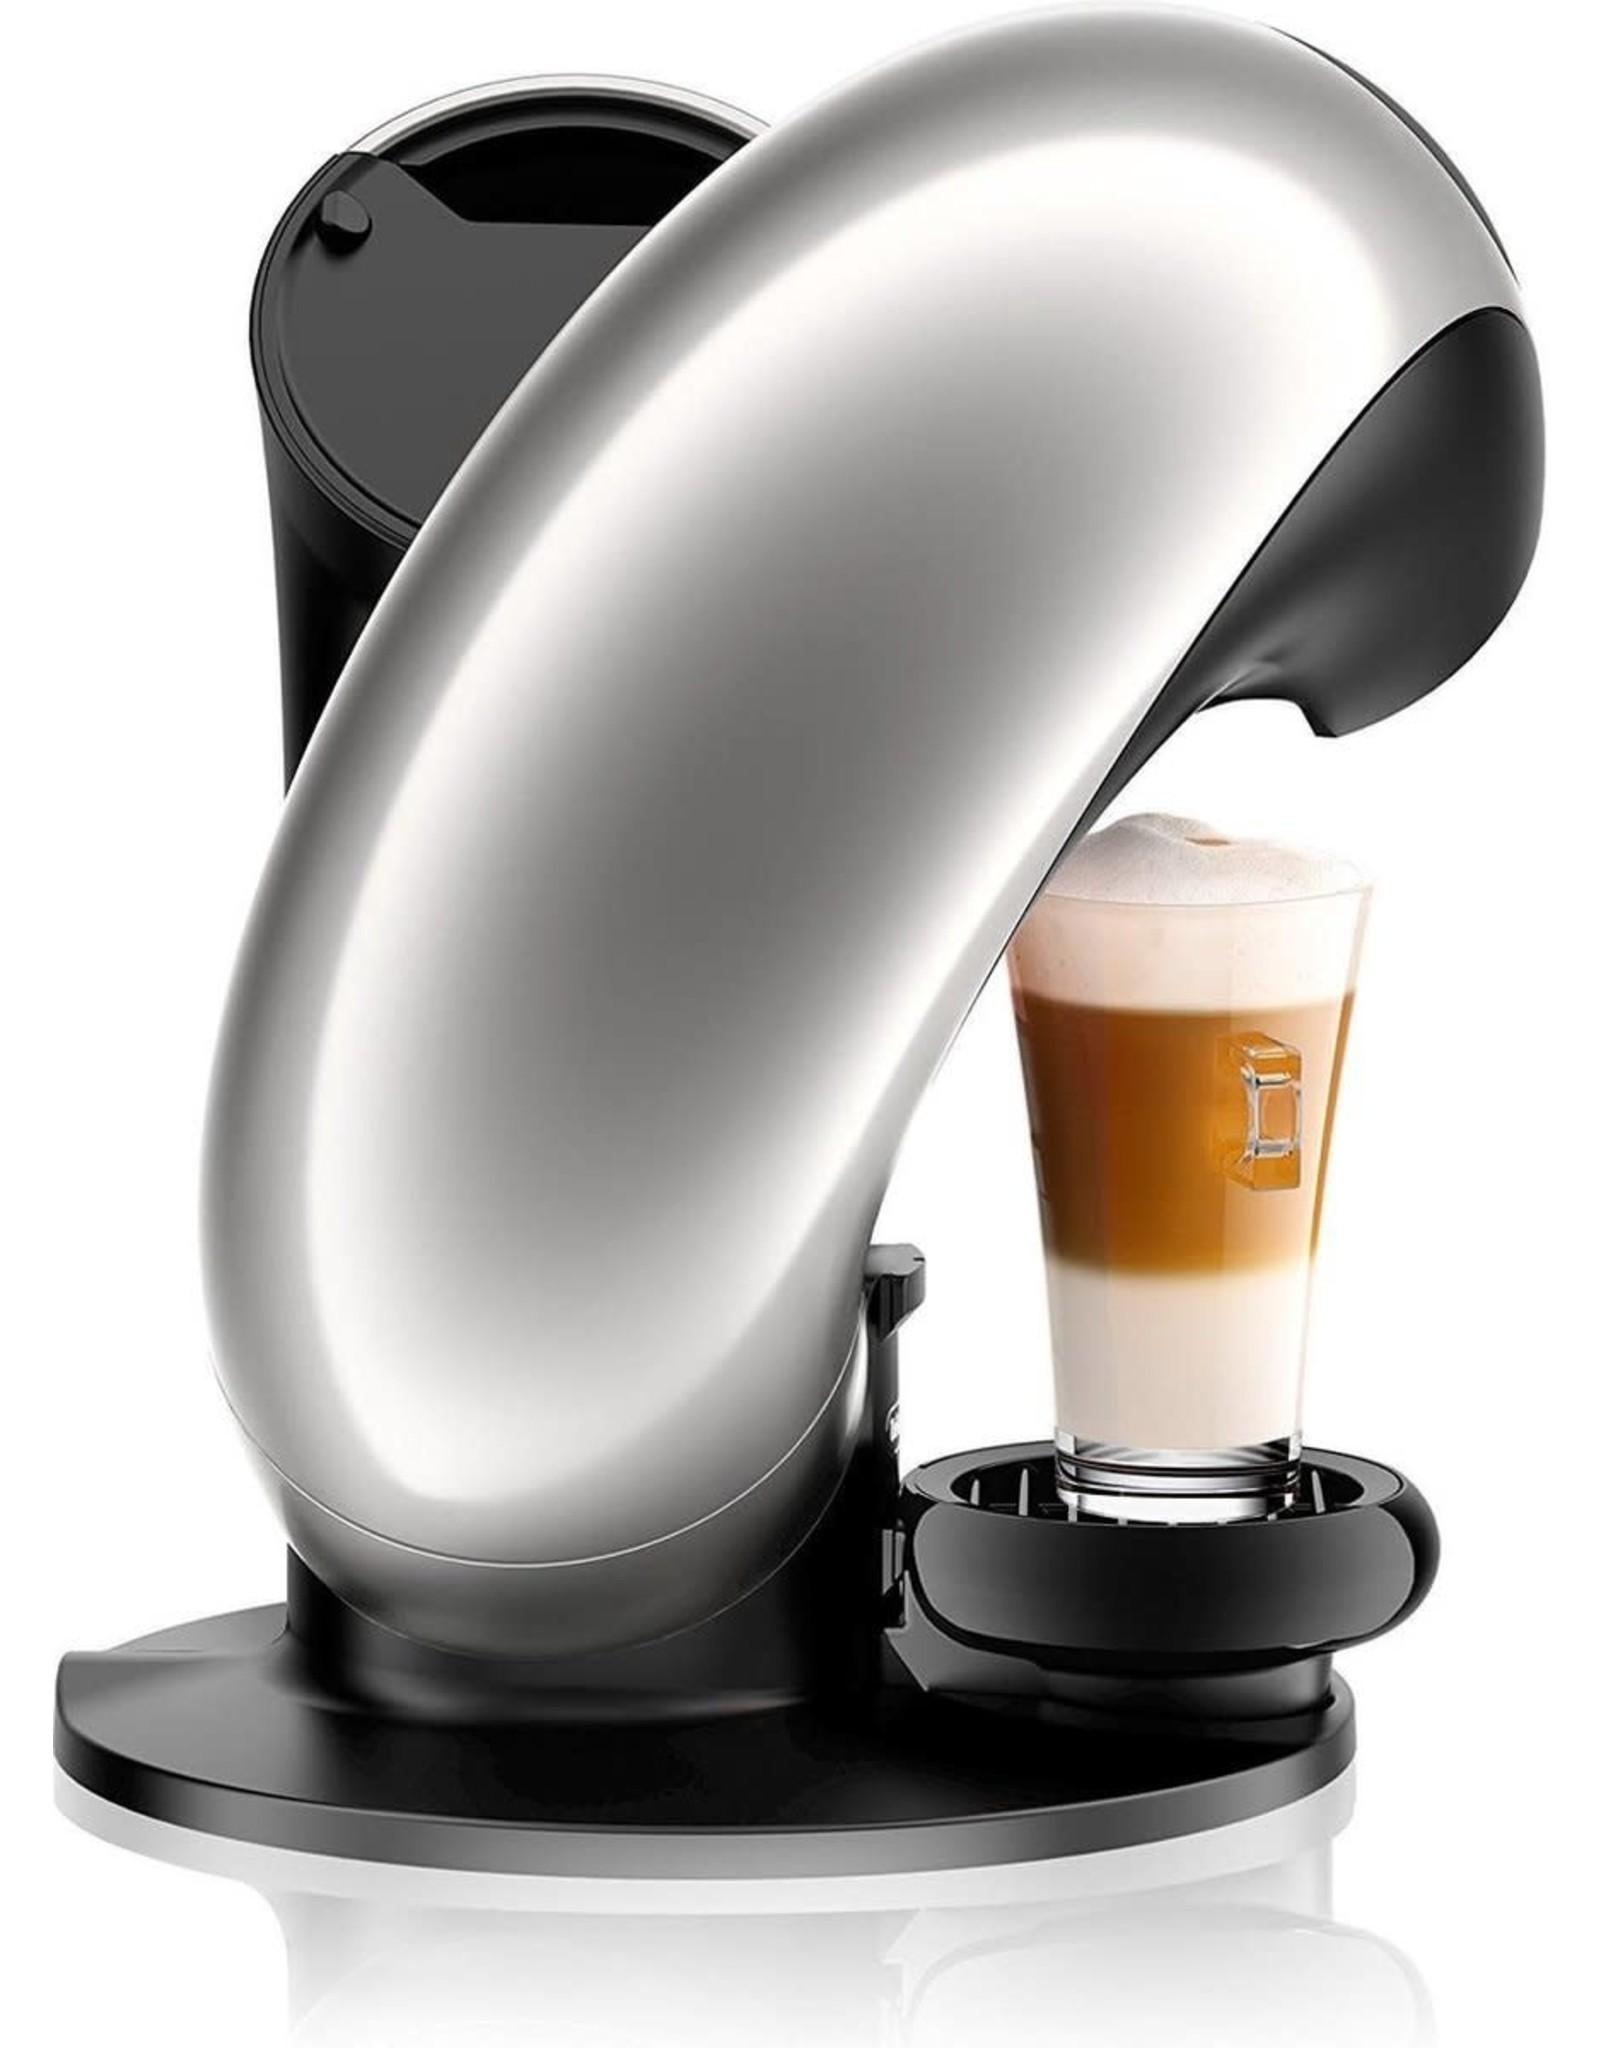 DeLonghi Nescafé Dolce Gusto Eclipse EDG 736.S - Koffiecupmachine